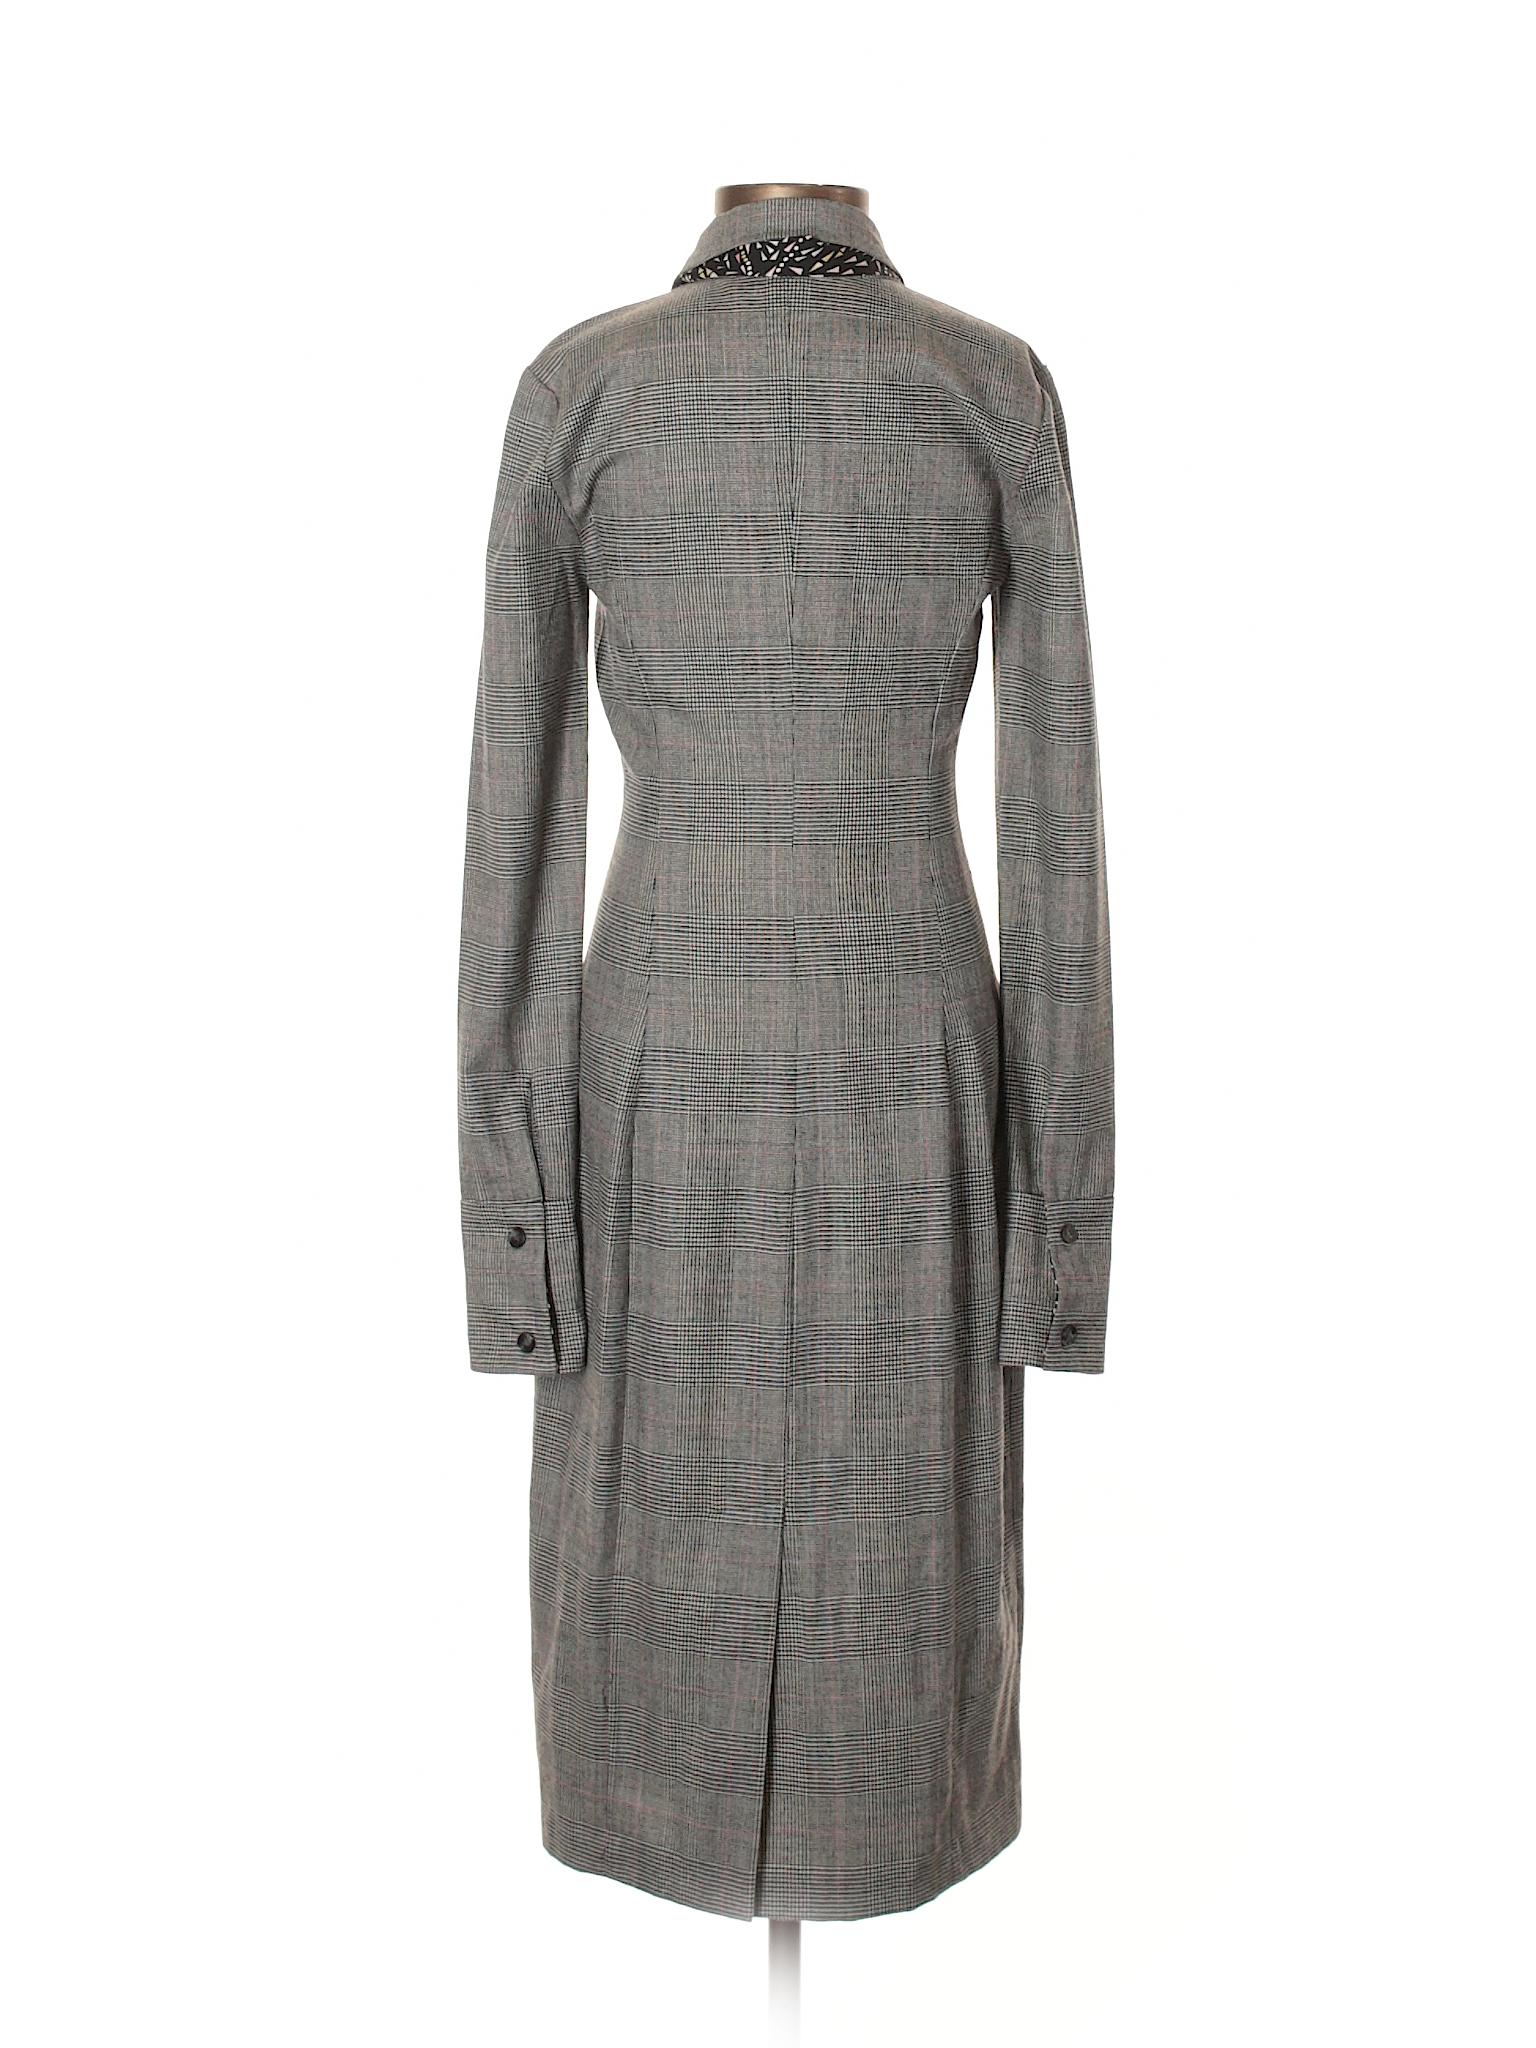 winter Casual Diane Furstenberg Dress Boutique von 5dIFfnwUq